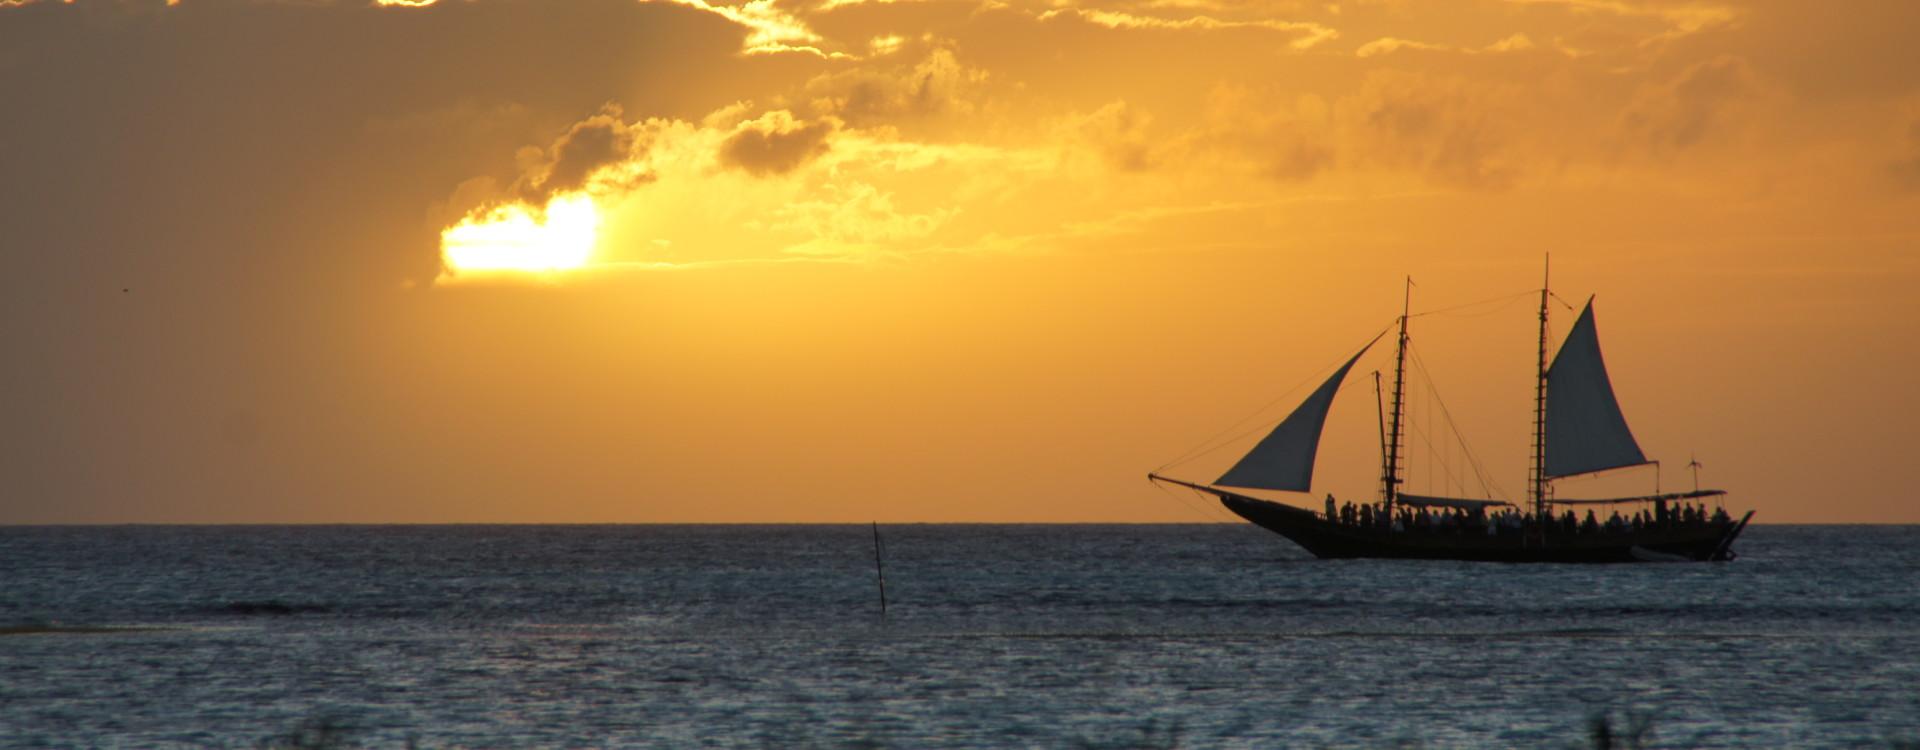 Malmok Coastline at Sunset